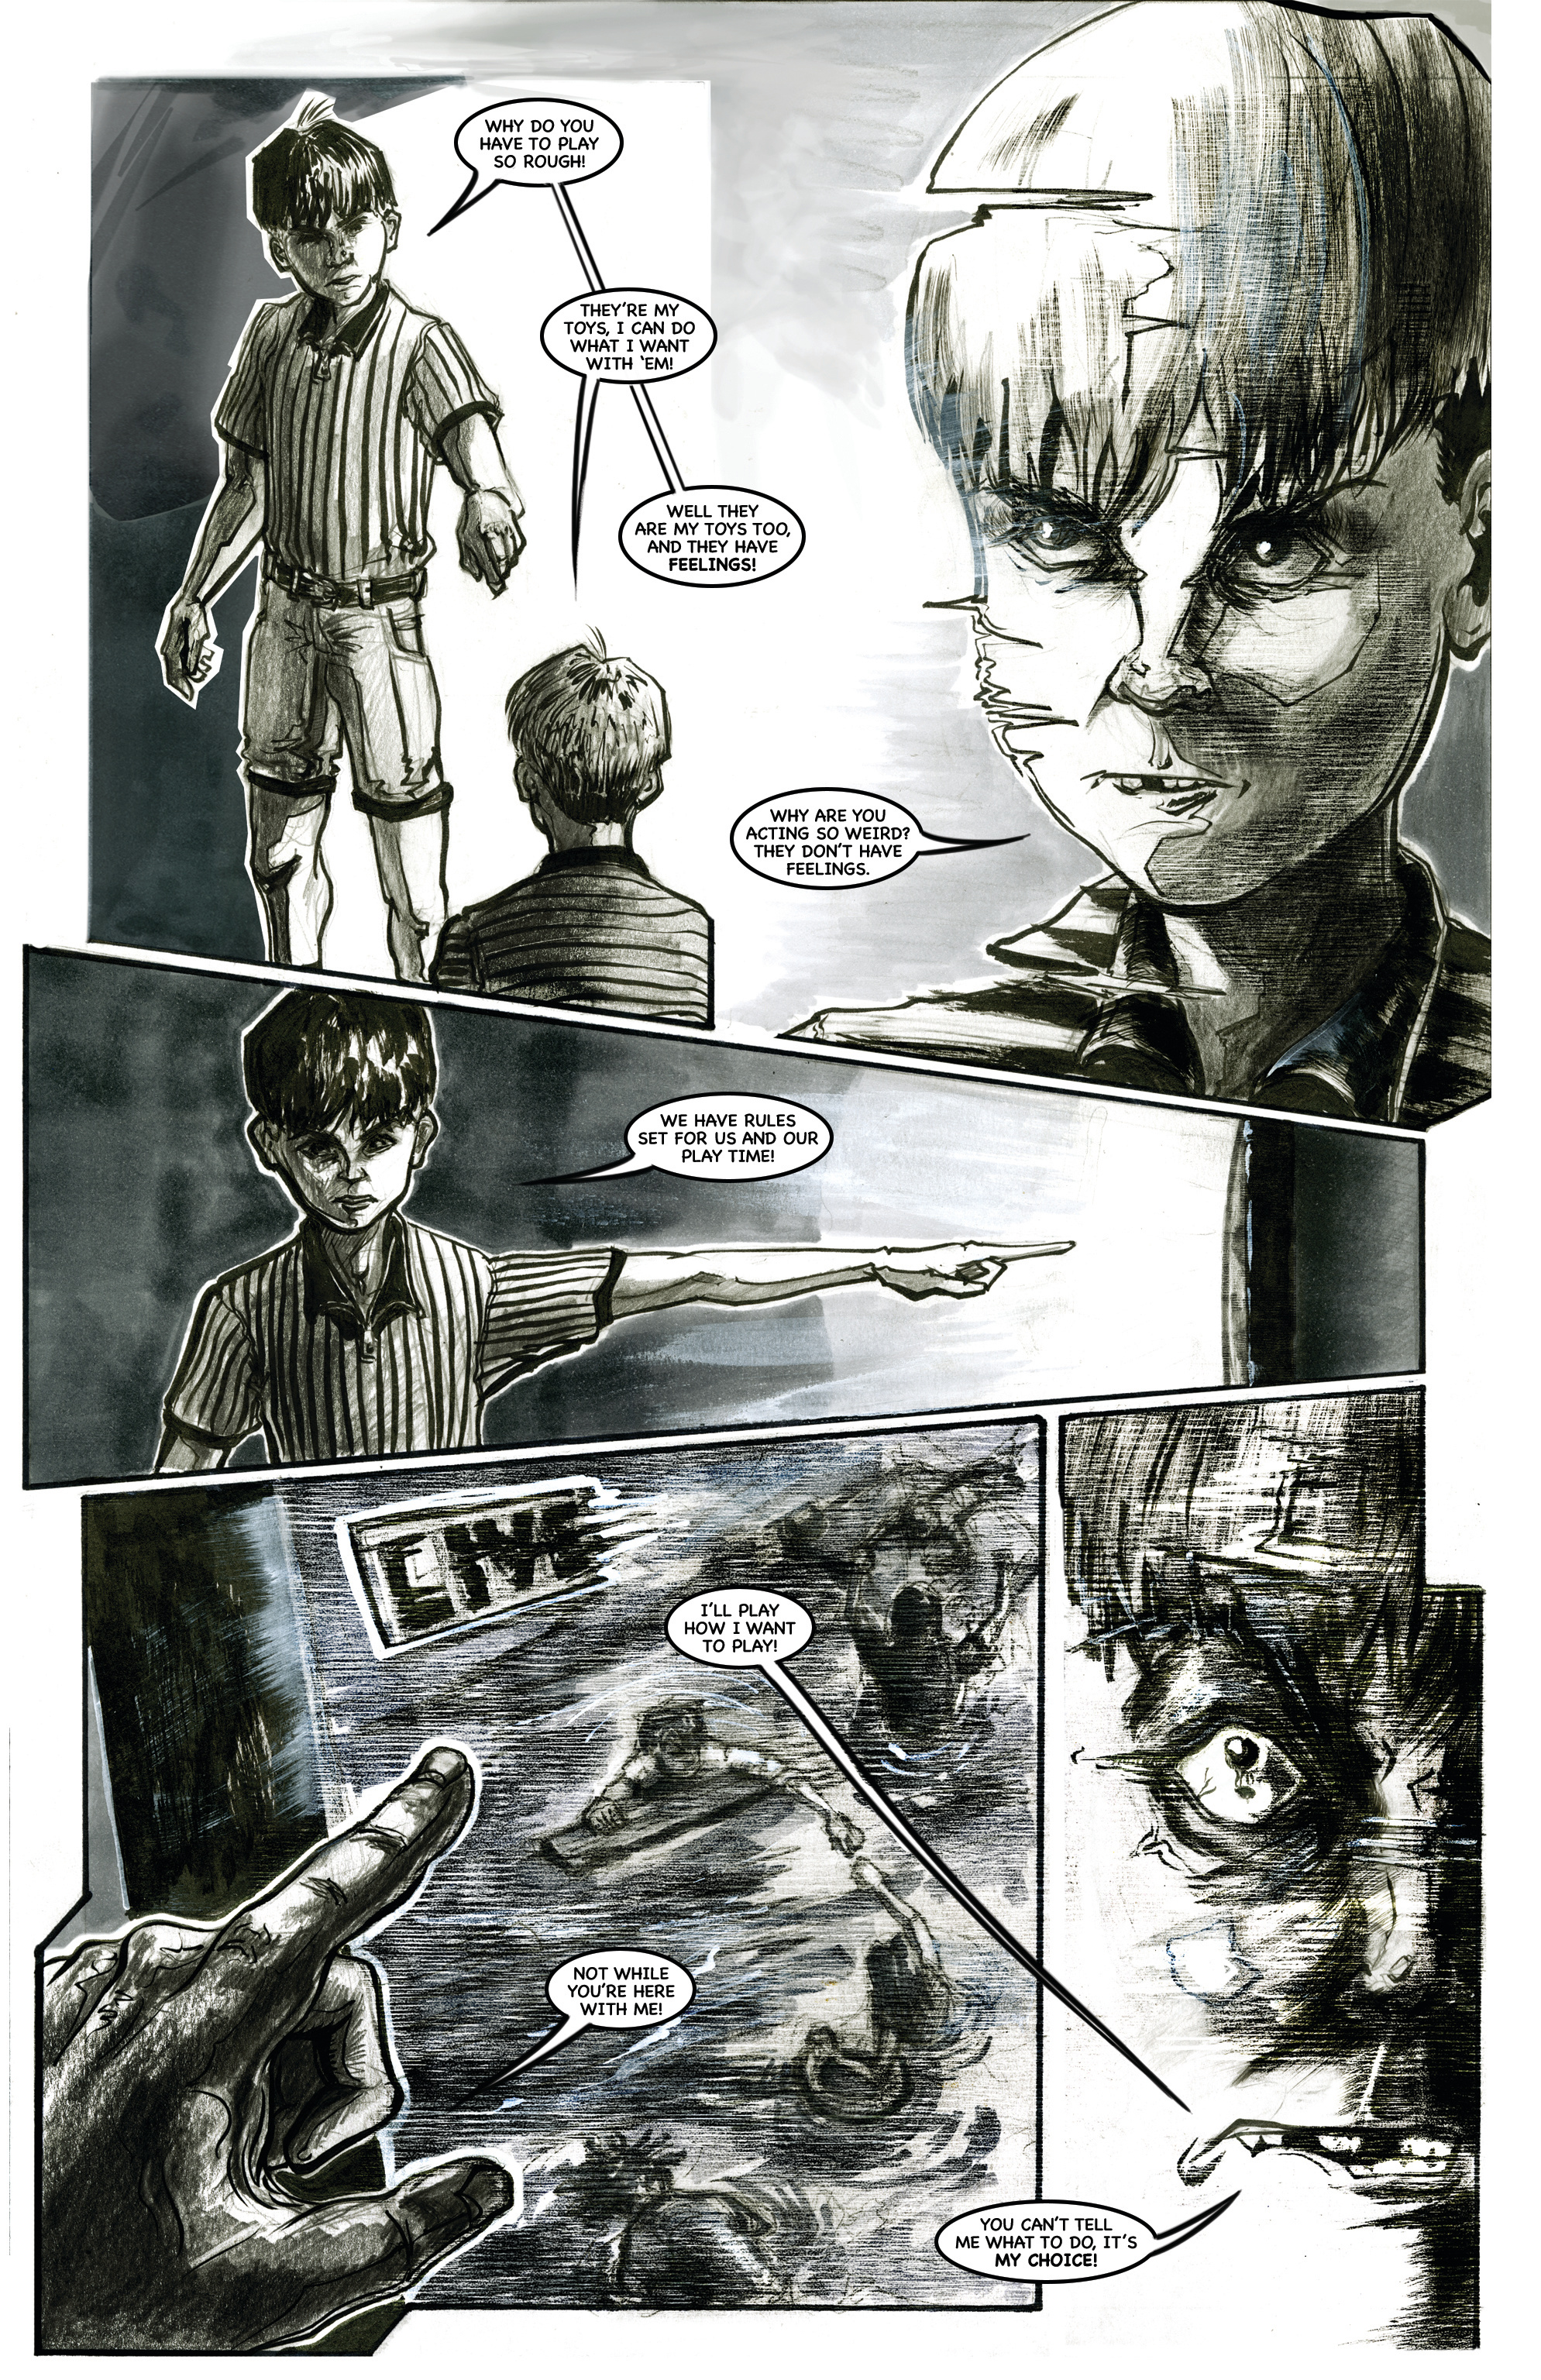 Sidewalk Prophet page 3